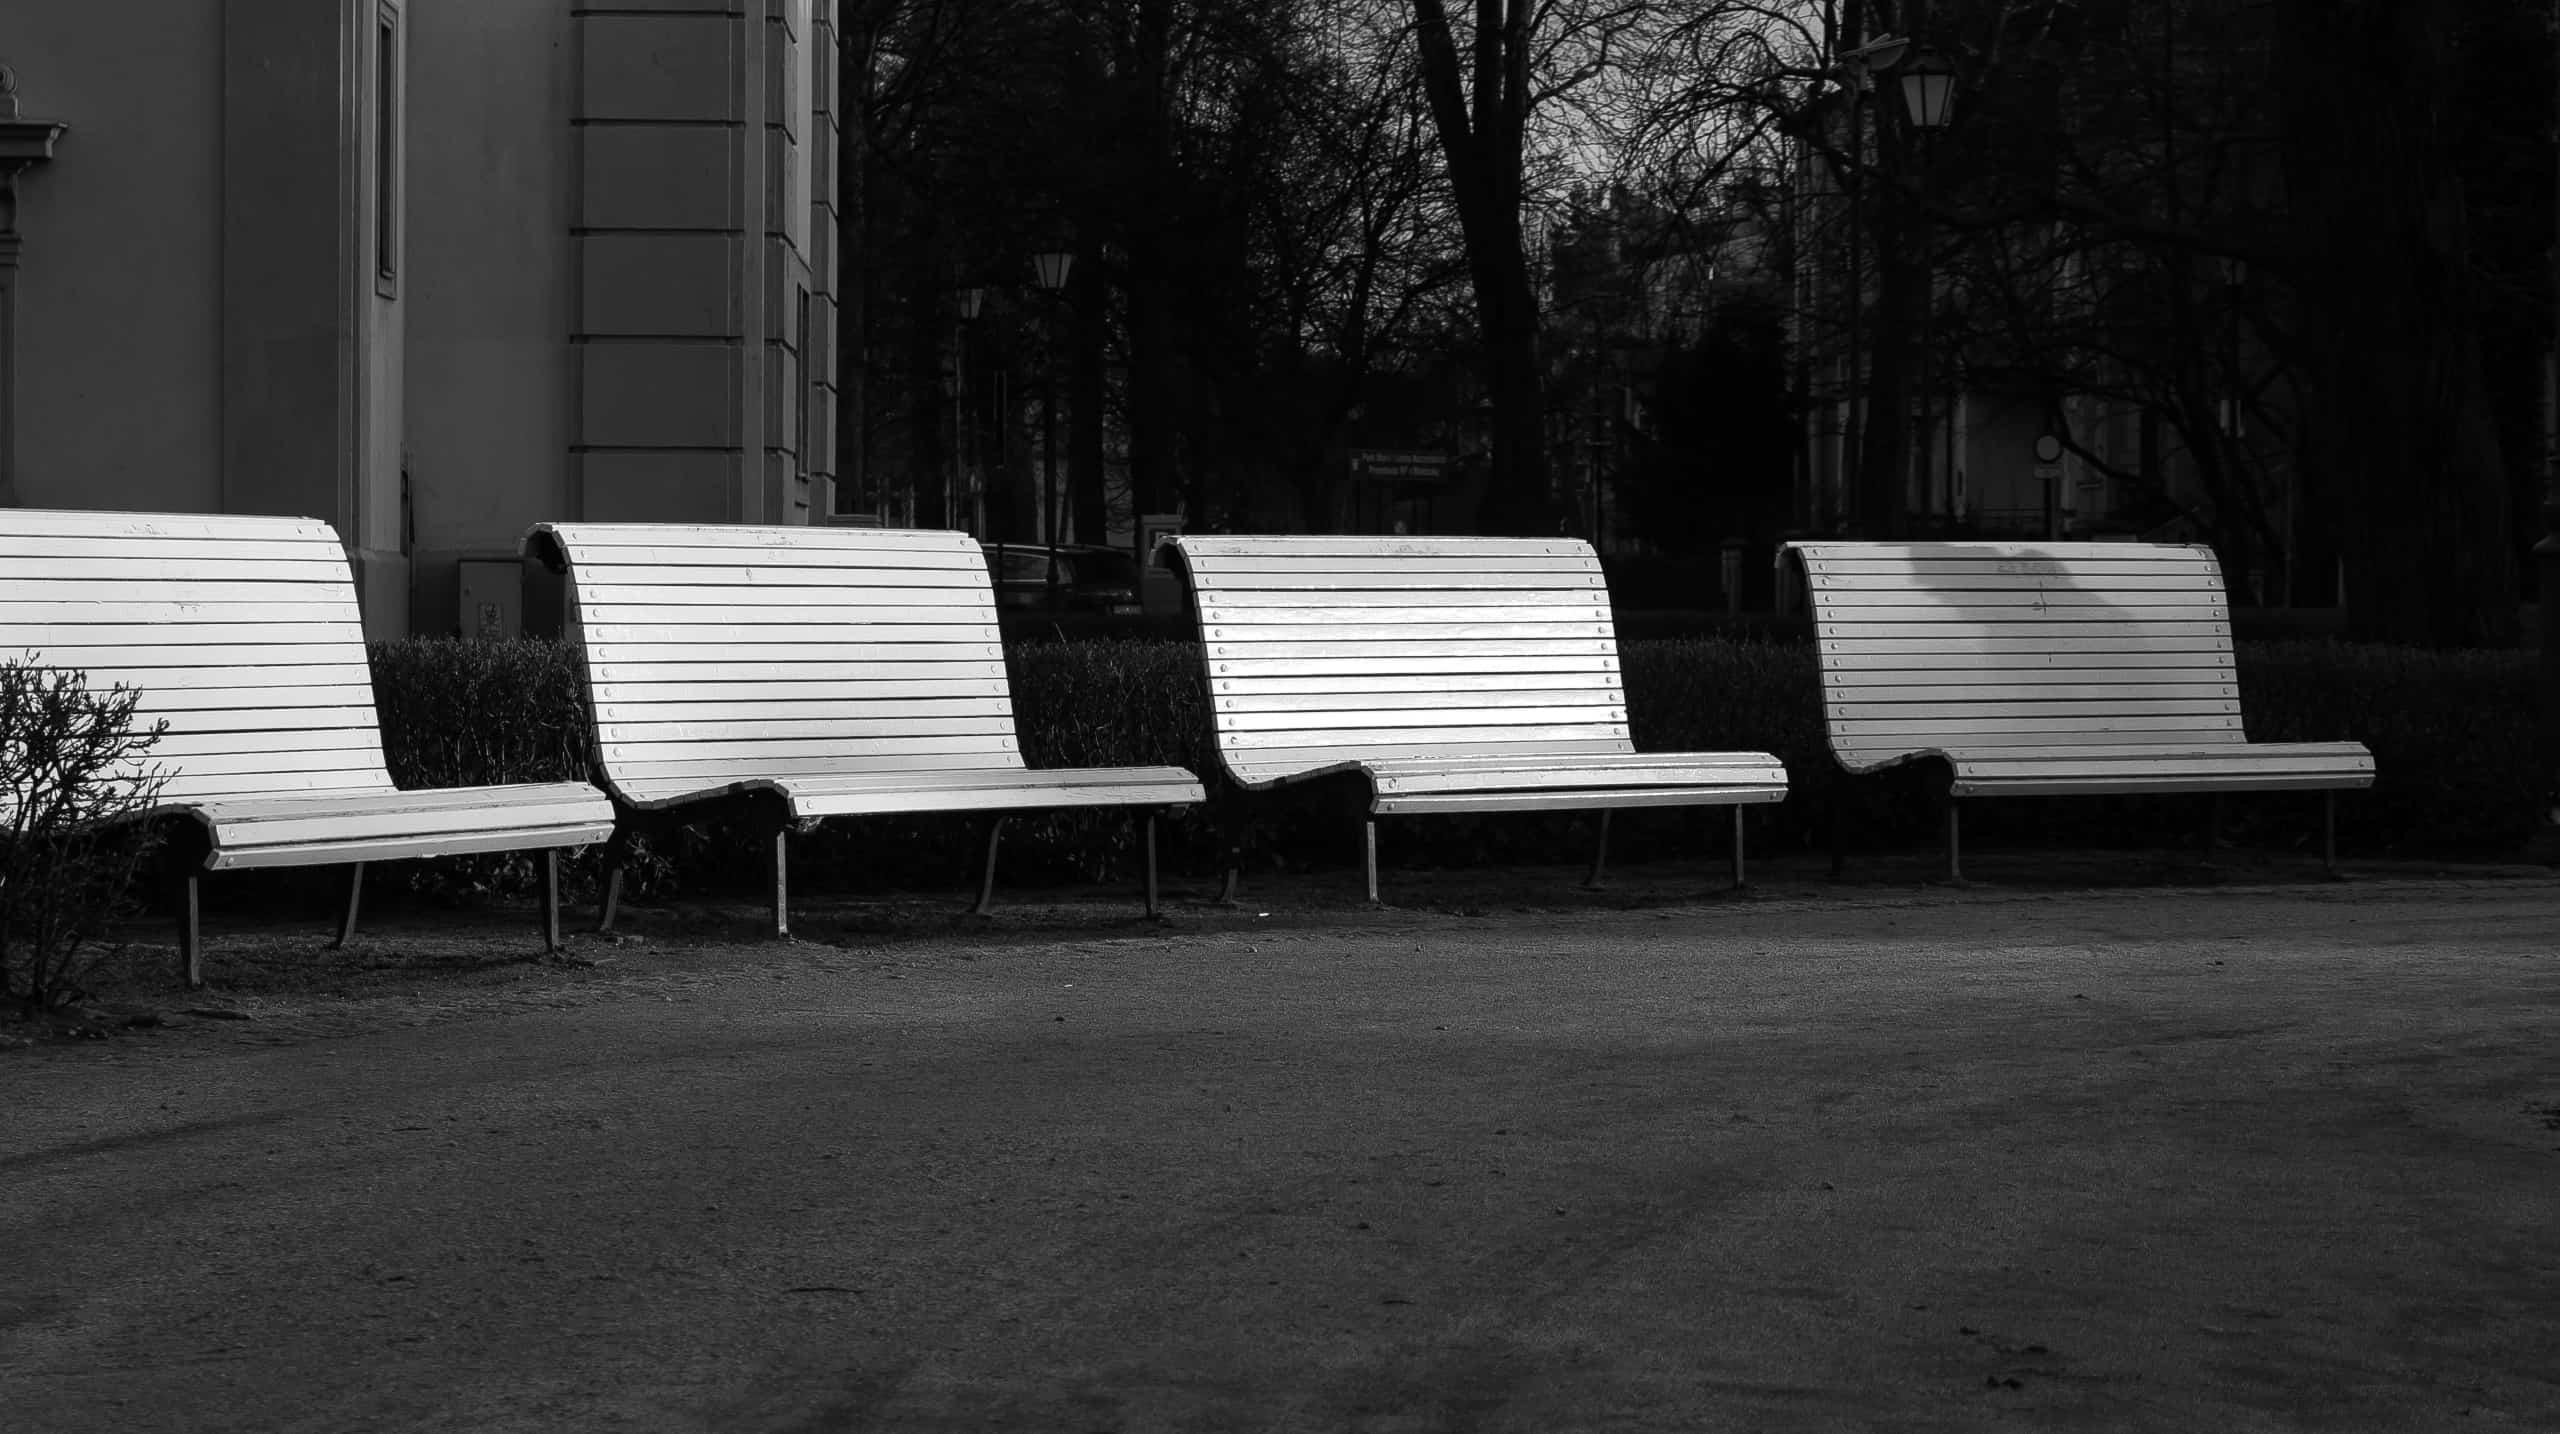 Rodzaje fotografii - fotografia uliczna